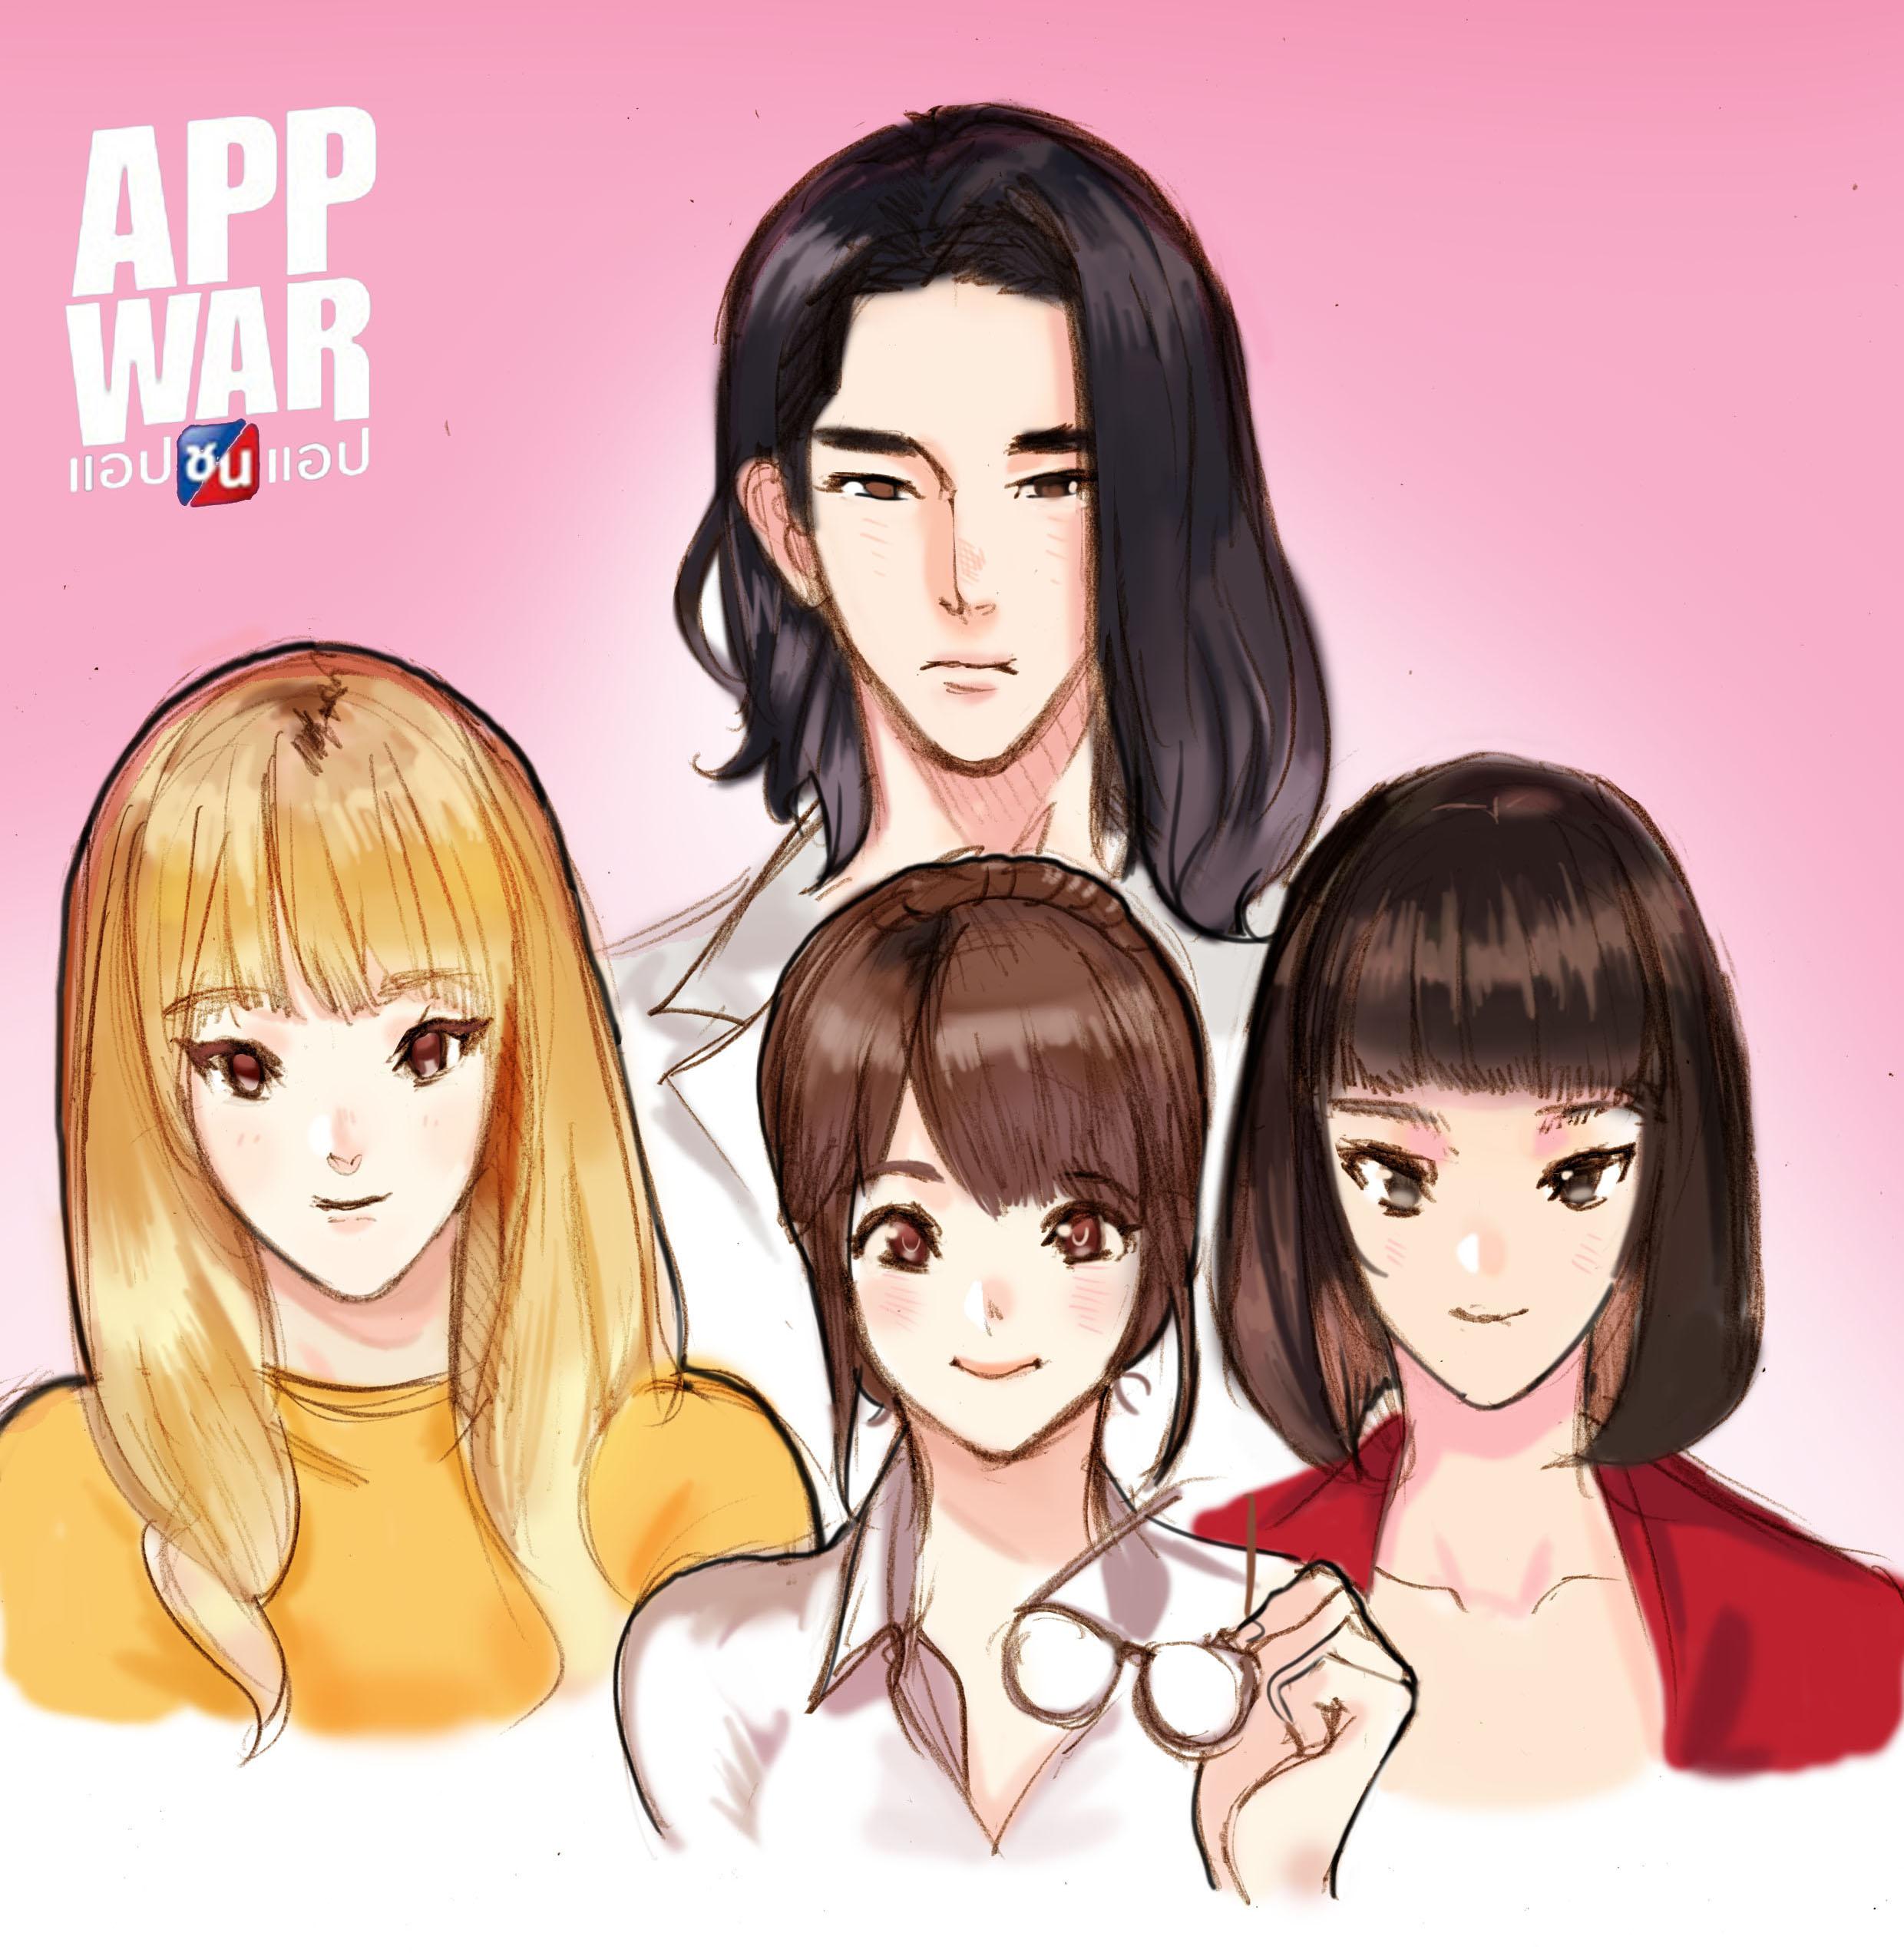 App War - Before the show